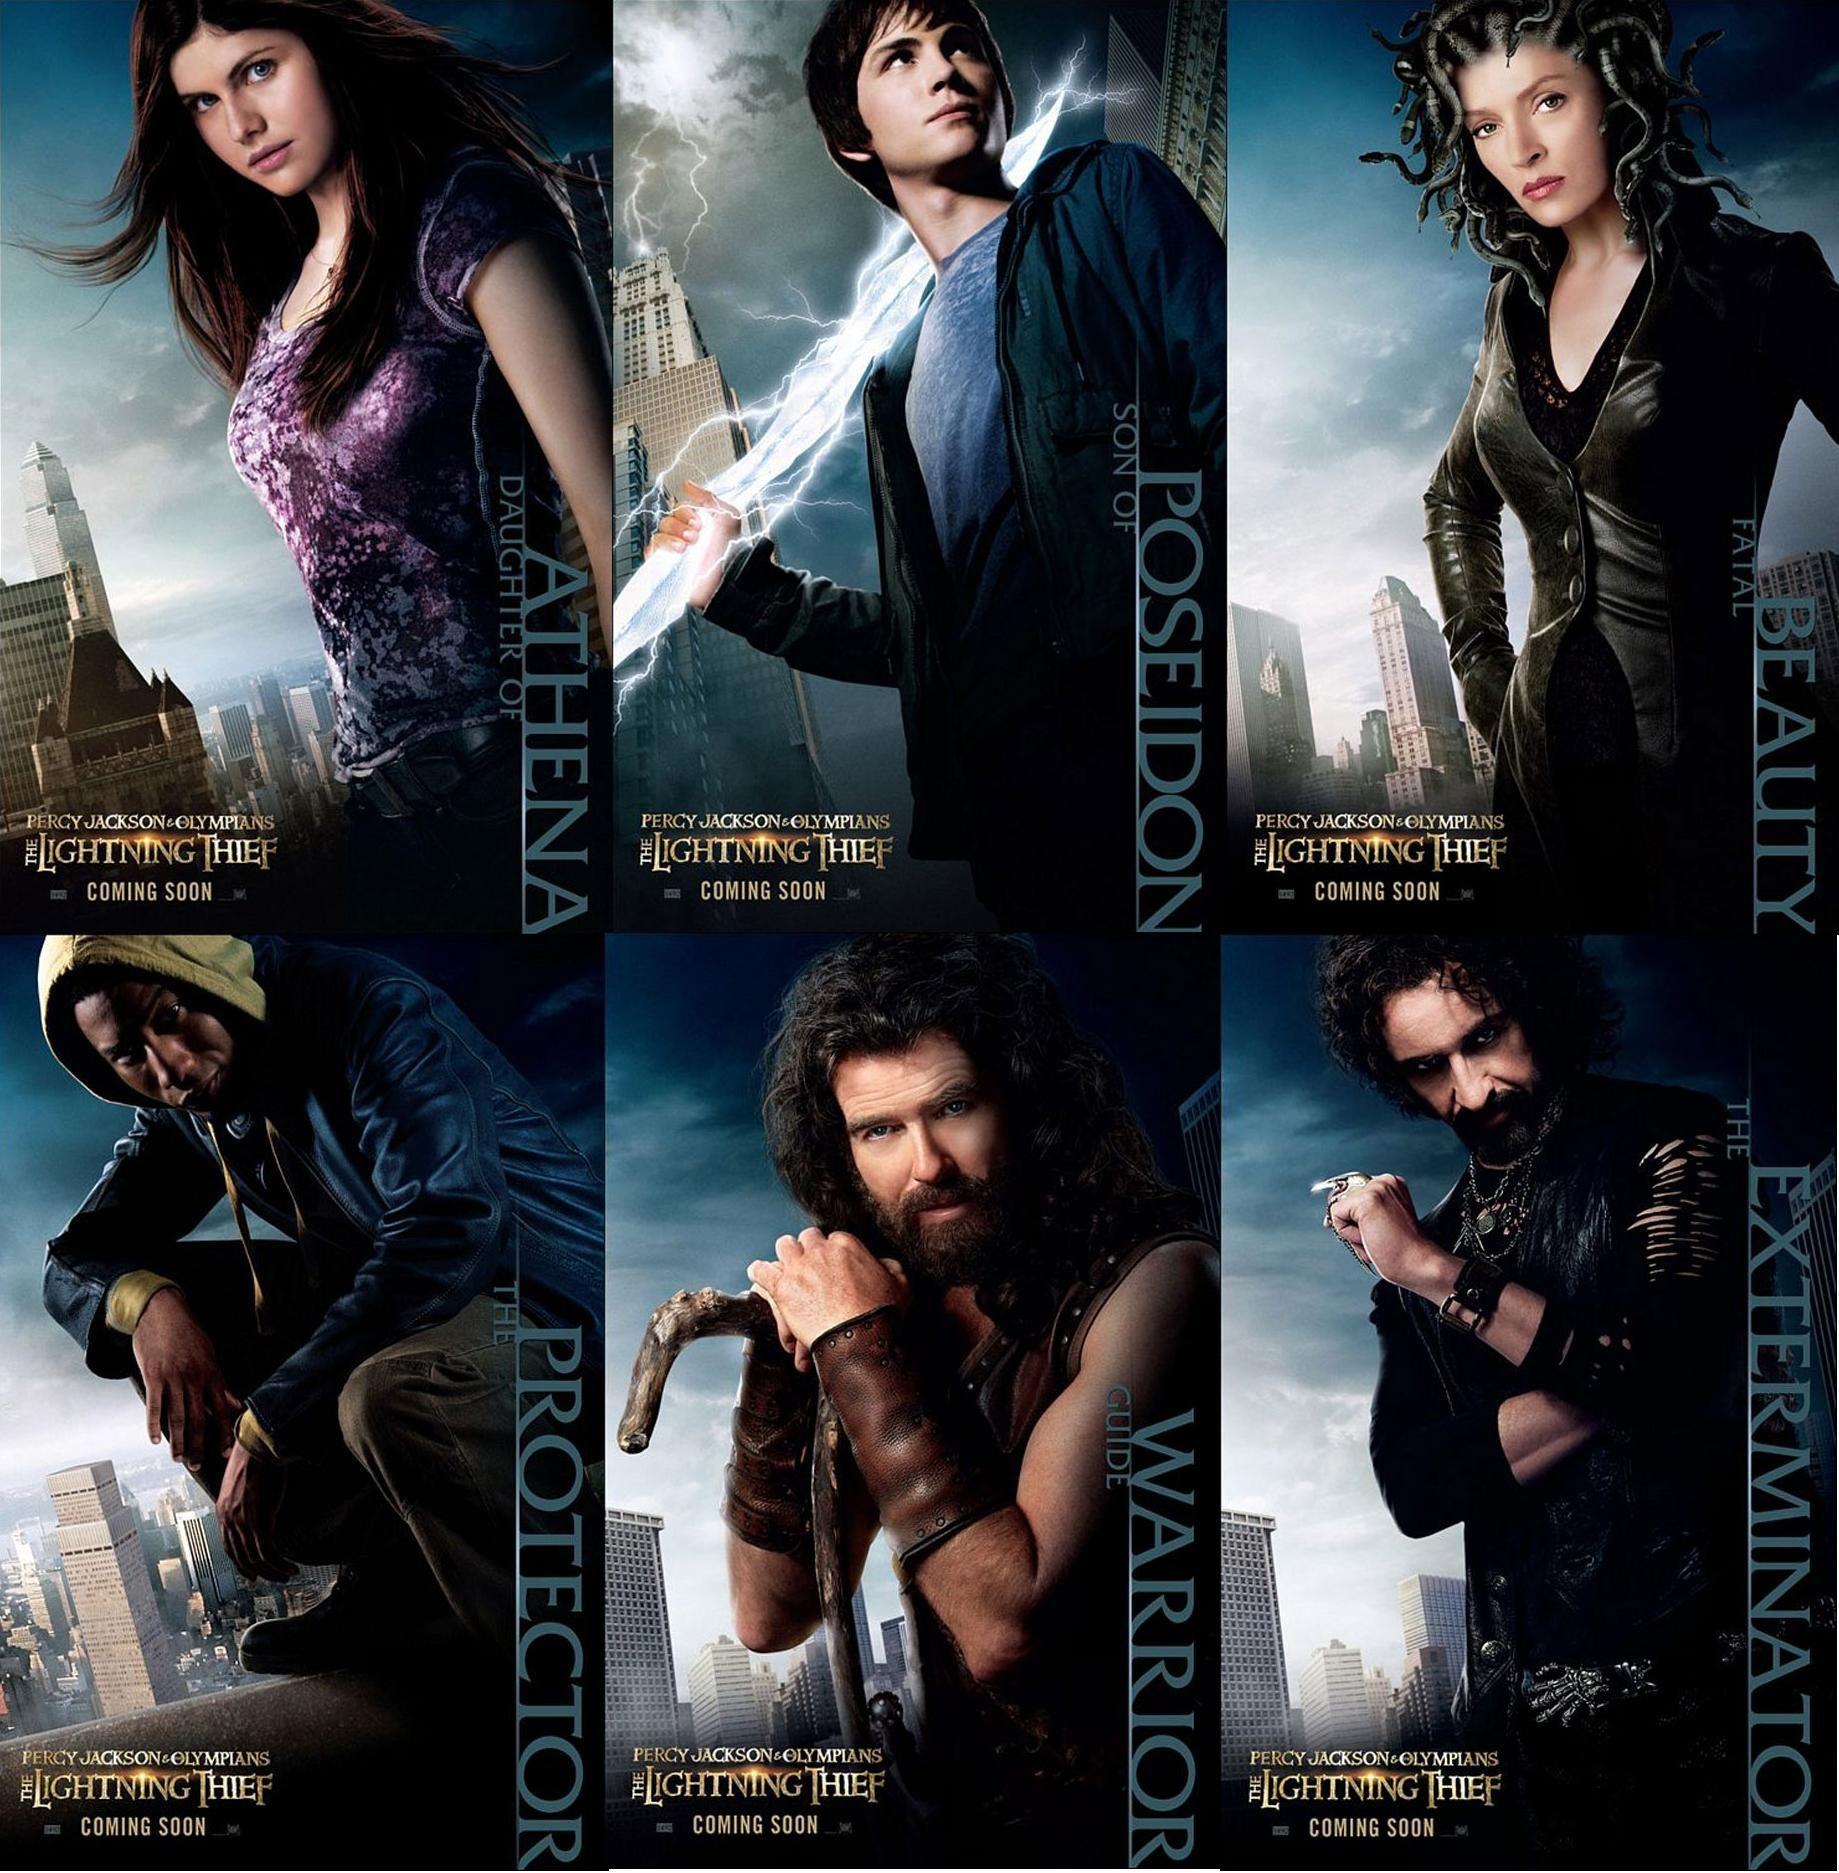 percy jackson and the olympians full movie